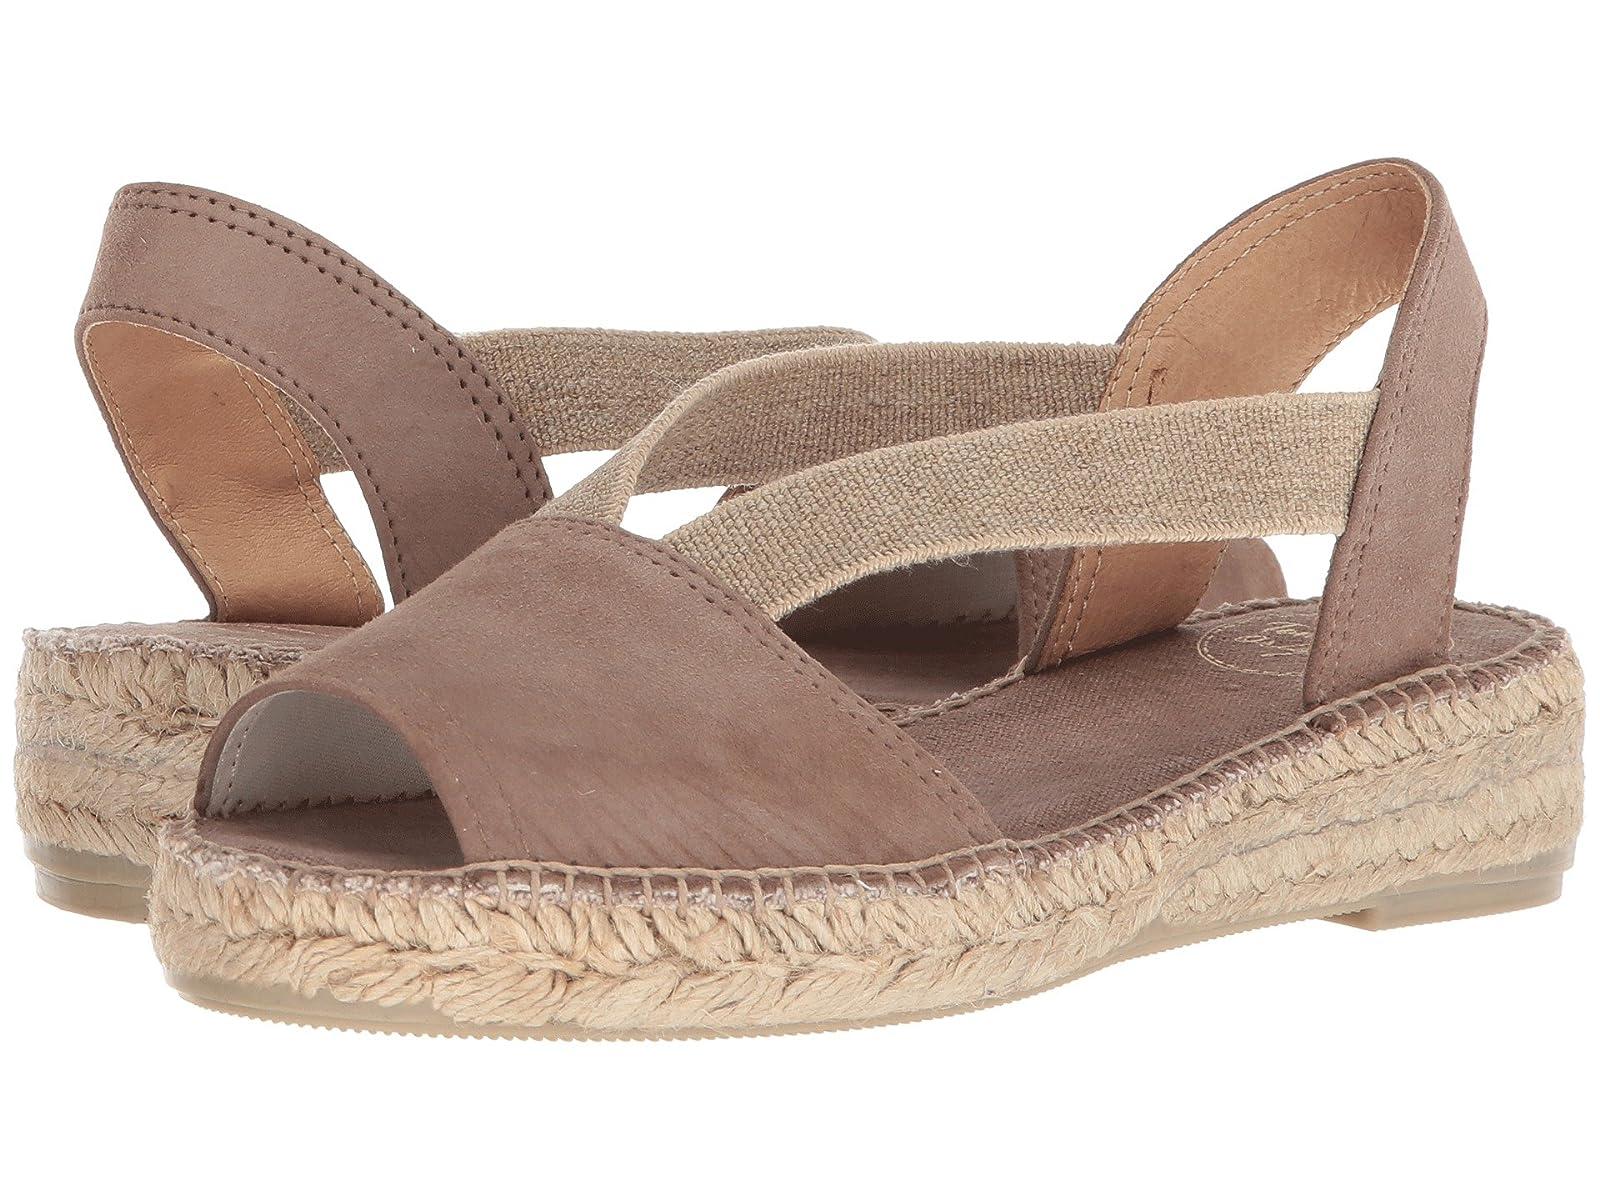 Toni Pons EllaAtmospheric grades have affordable shoes